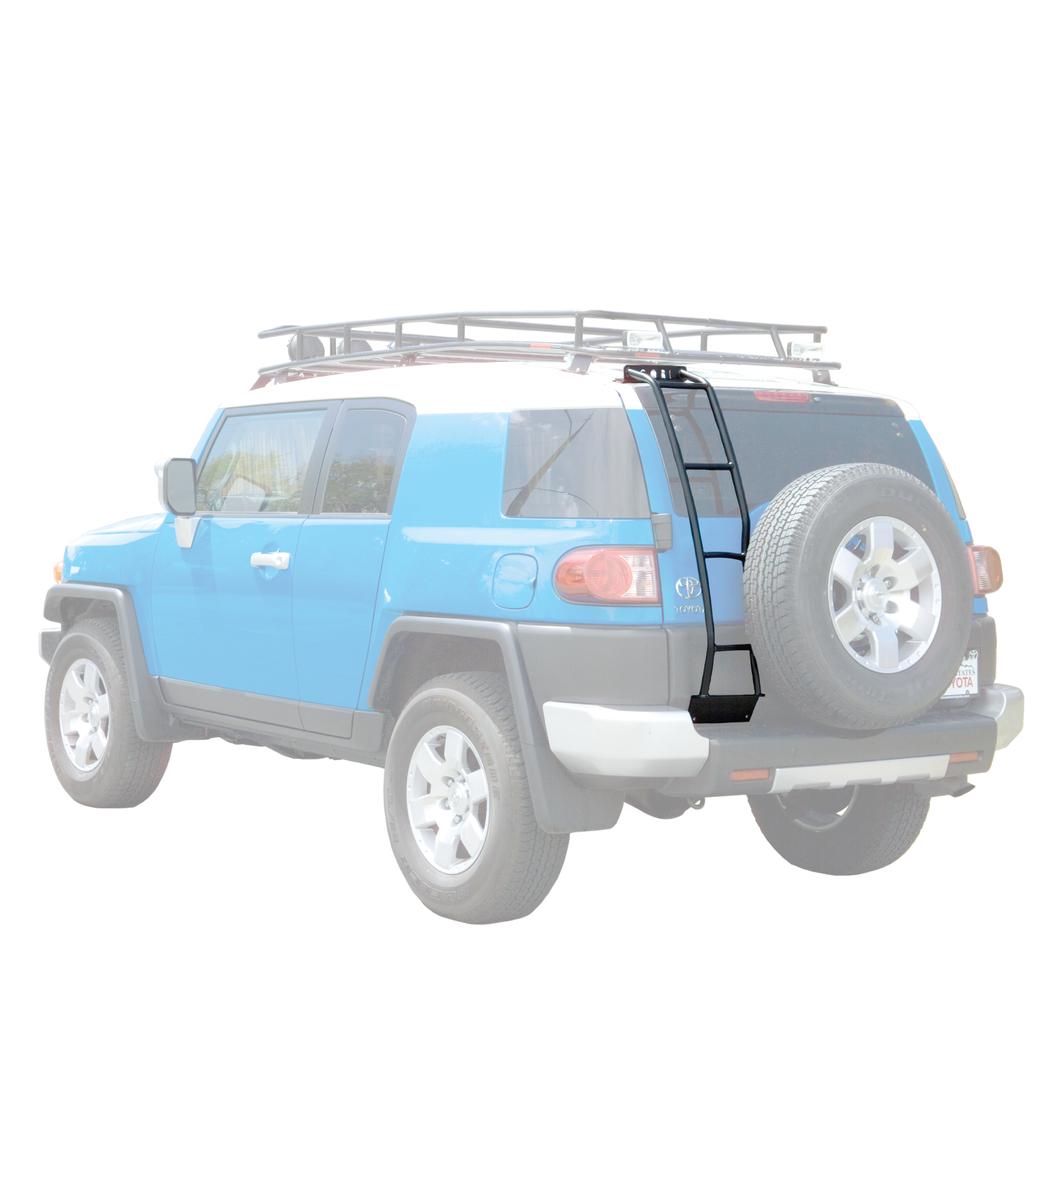 Gobi Toyota Fj Cruiser Rear Ladder With Spare Tire Driver Side